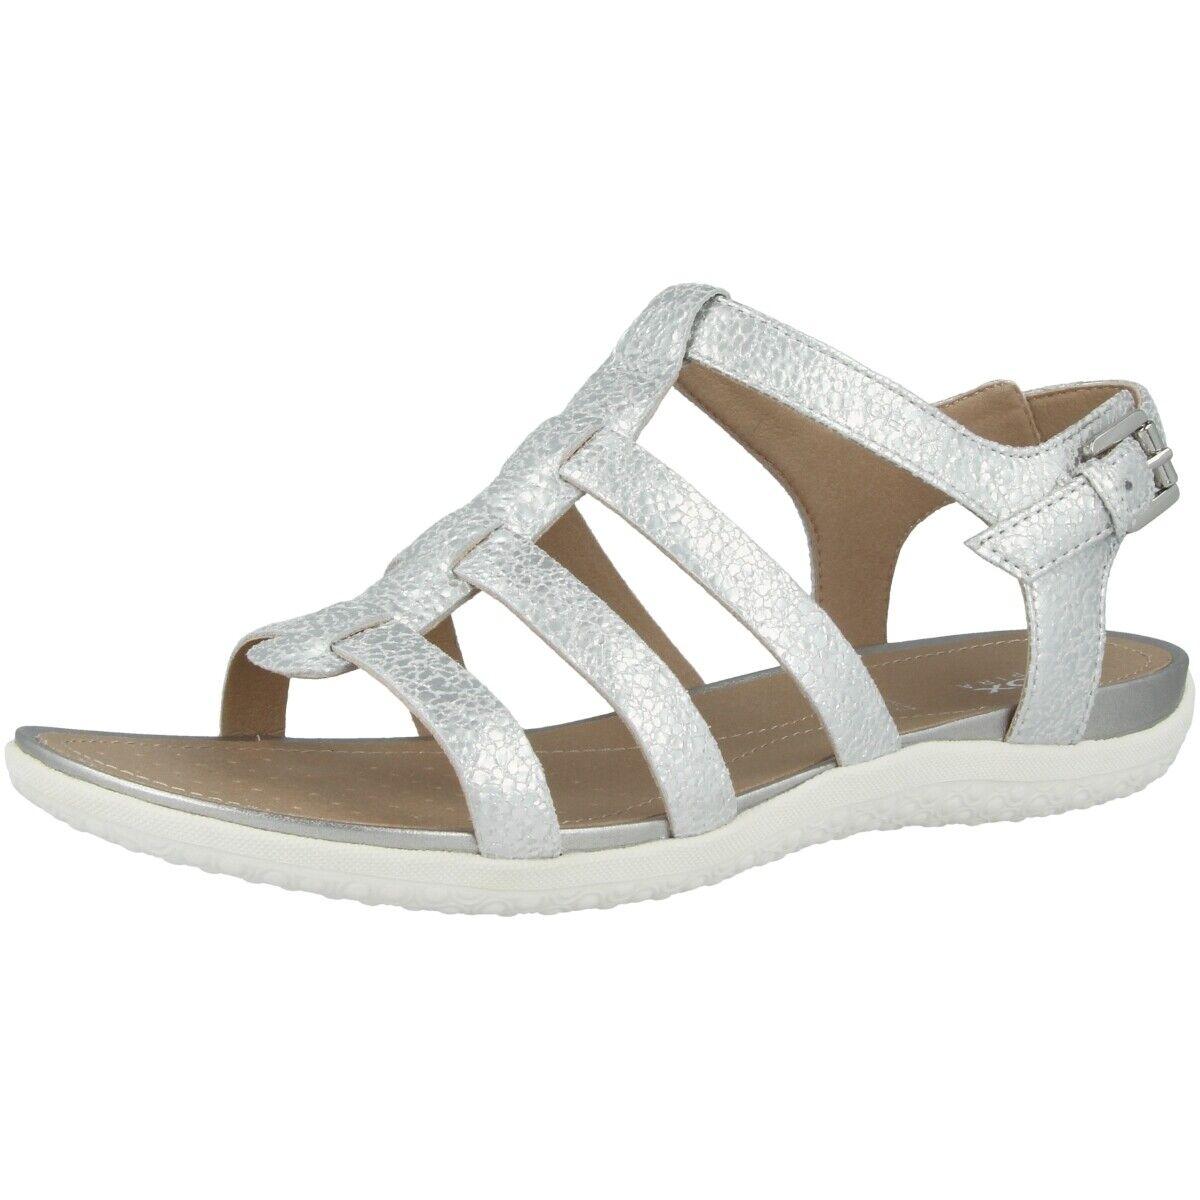 Geox d arena. vega a zapatos señora sandalias de ocio sandalias d72r6a000kyc1007